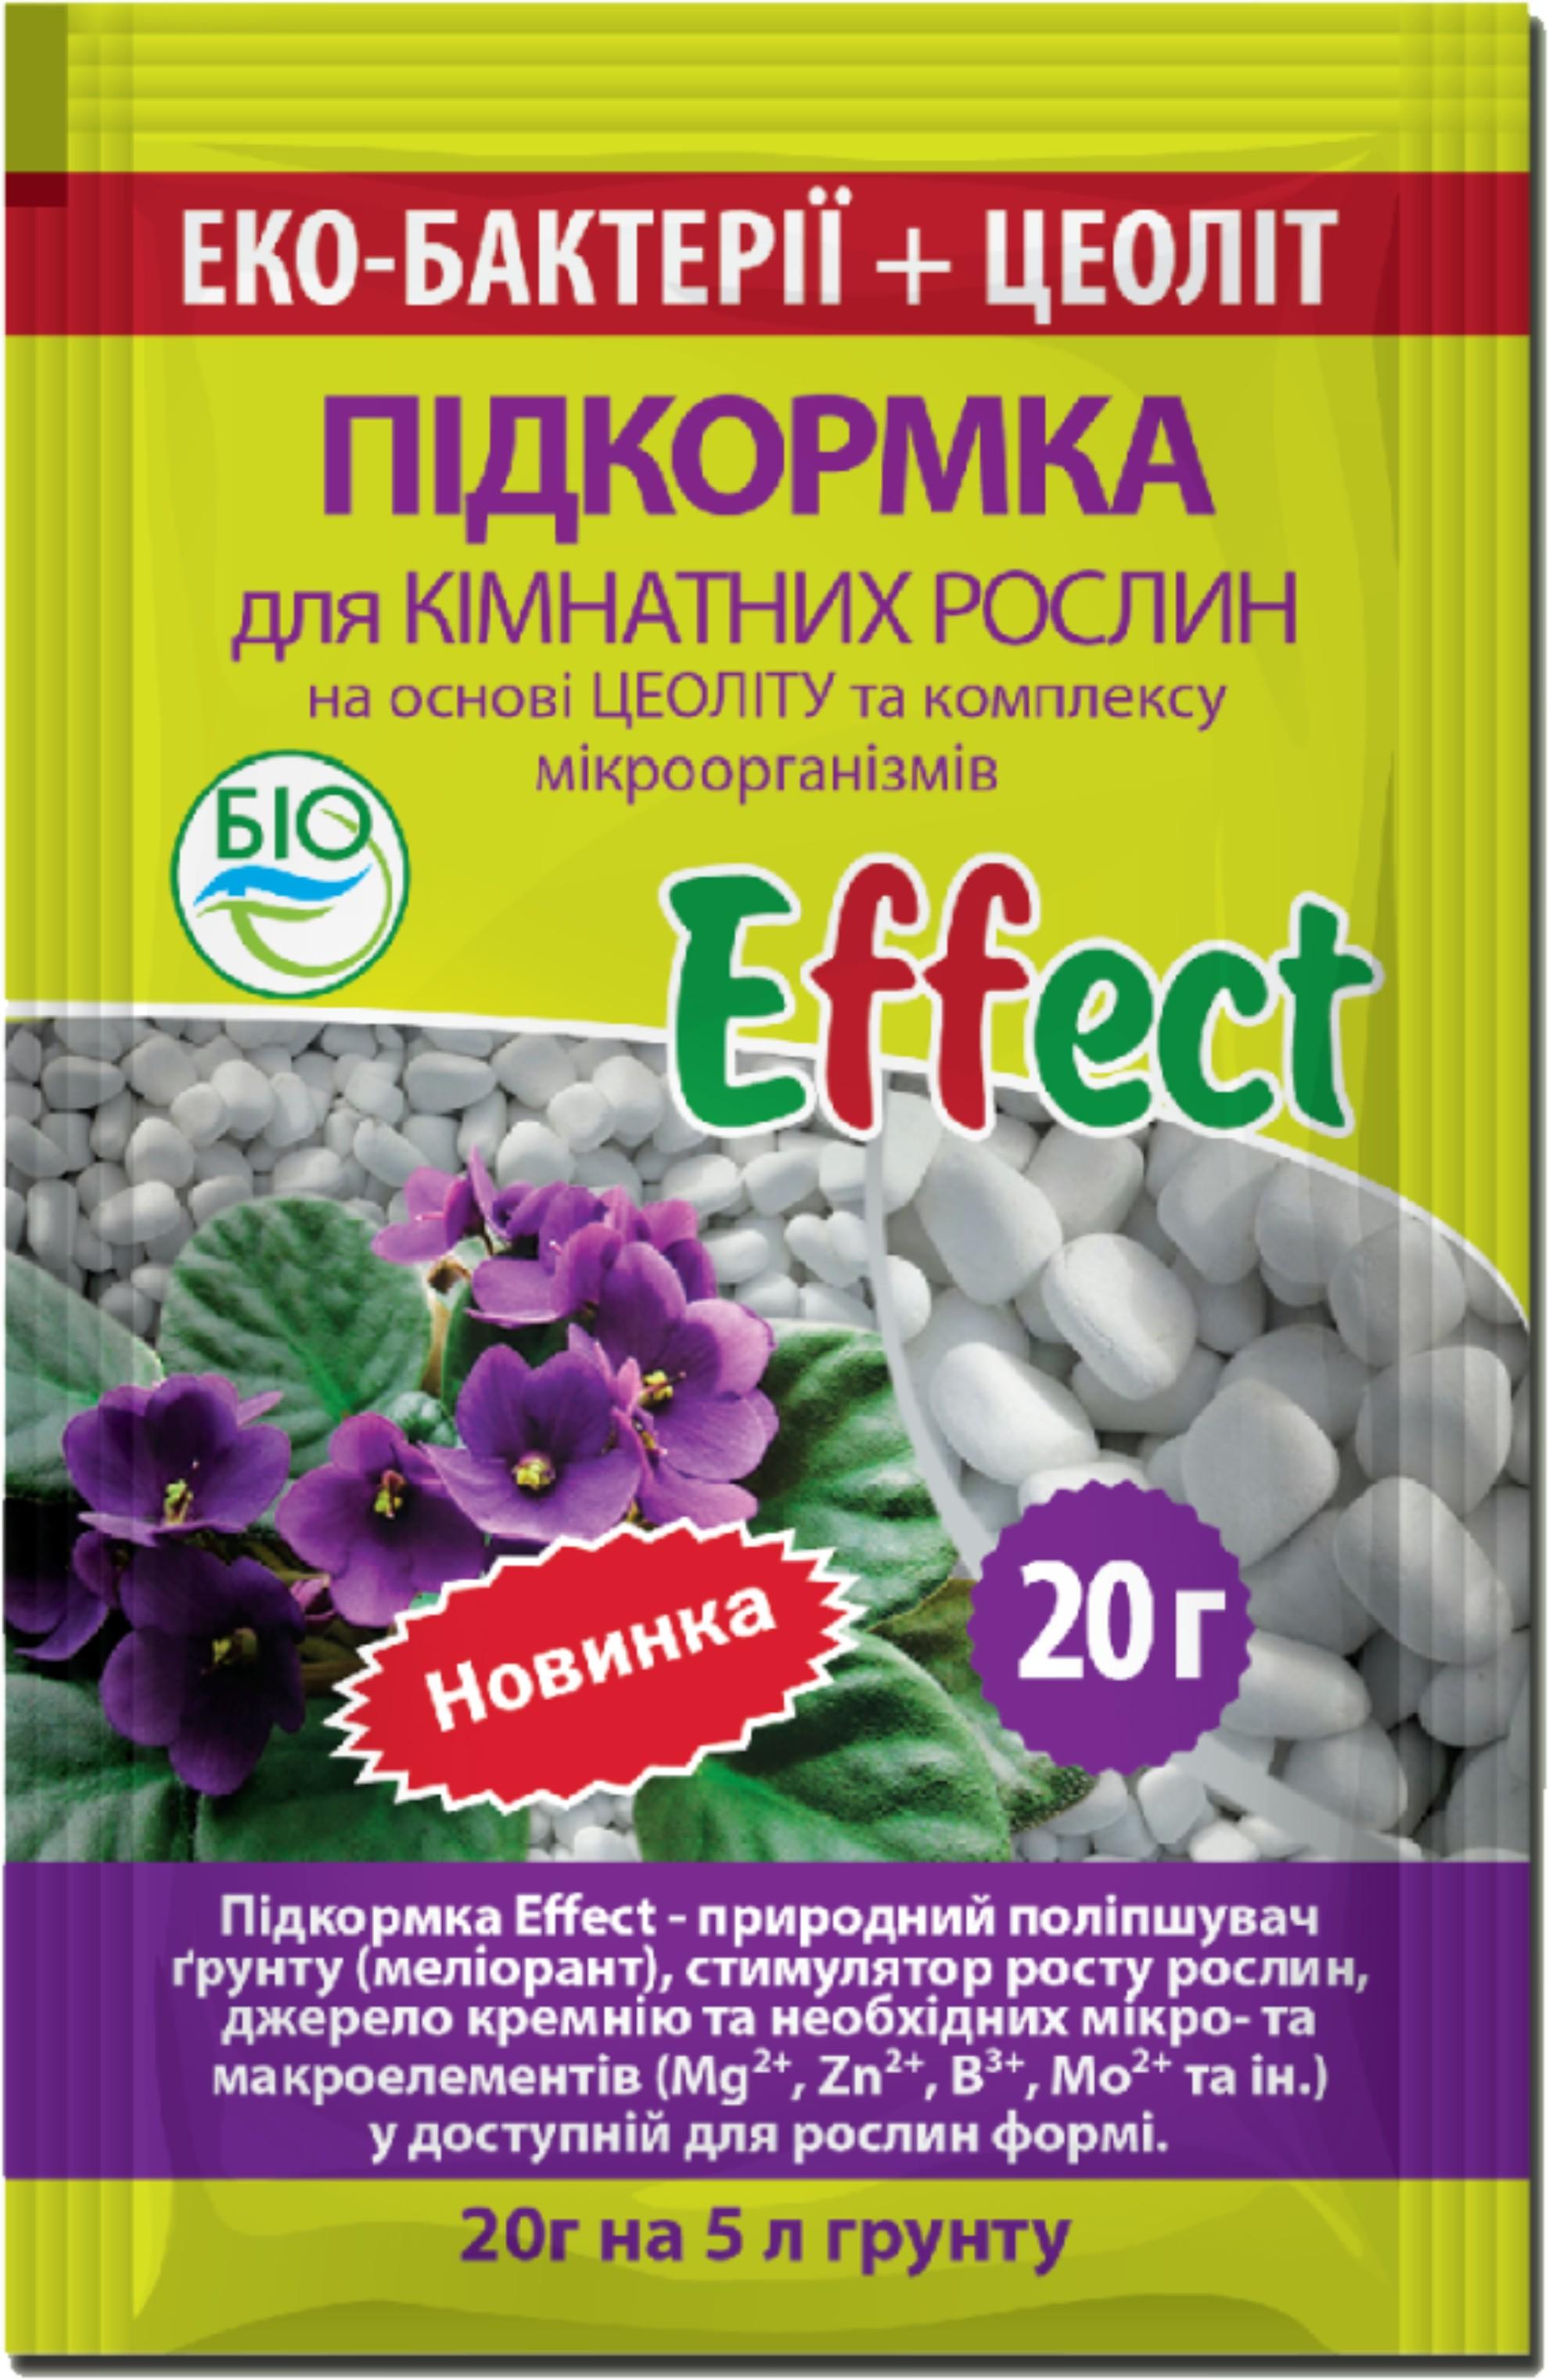 EFFECT organic fertilizer for houseplants image